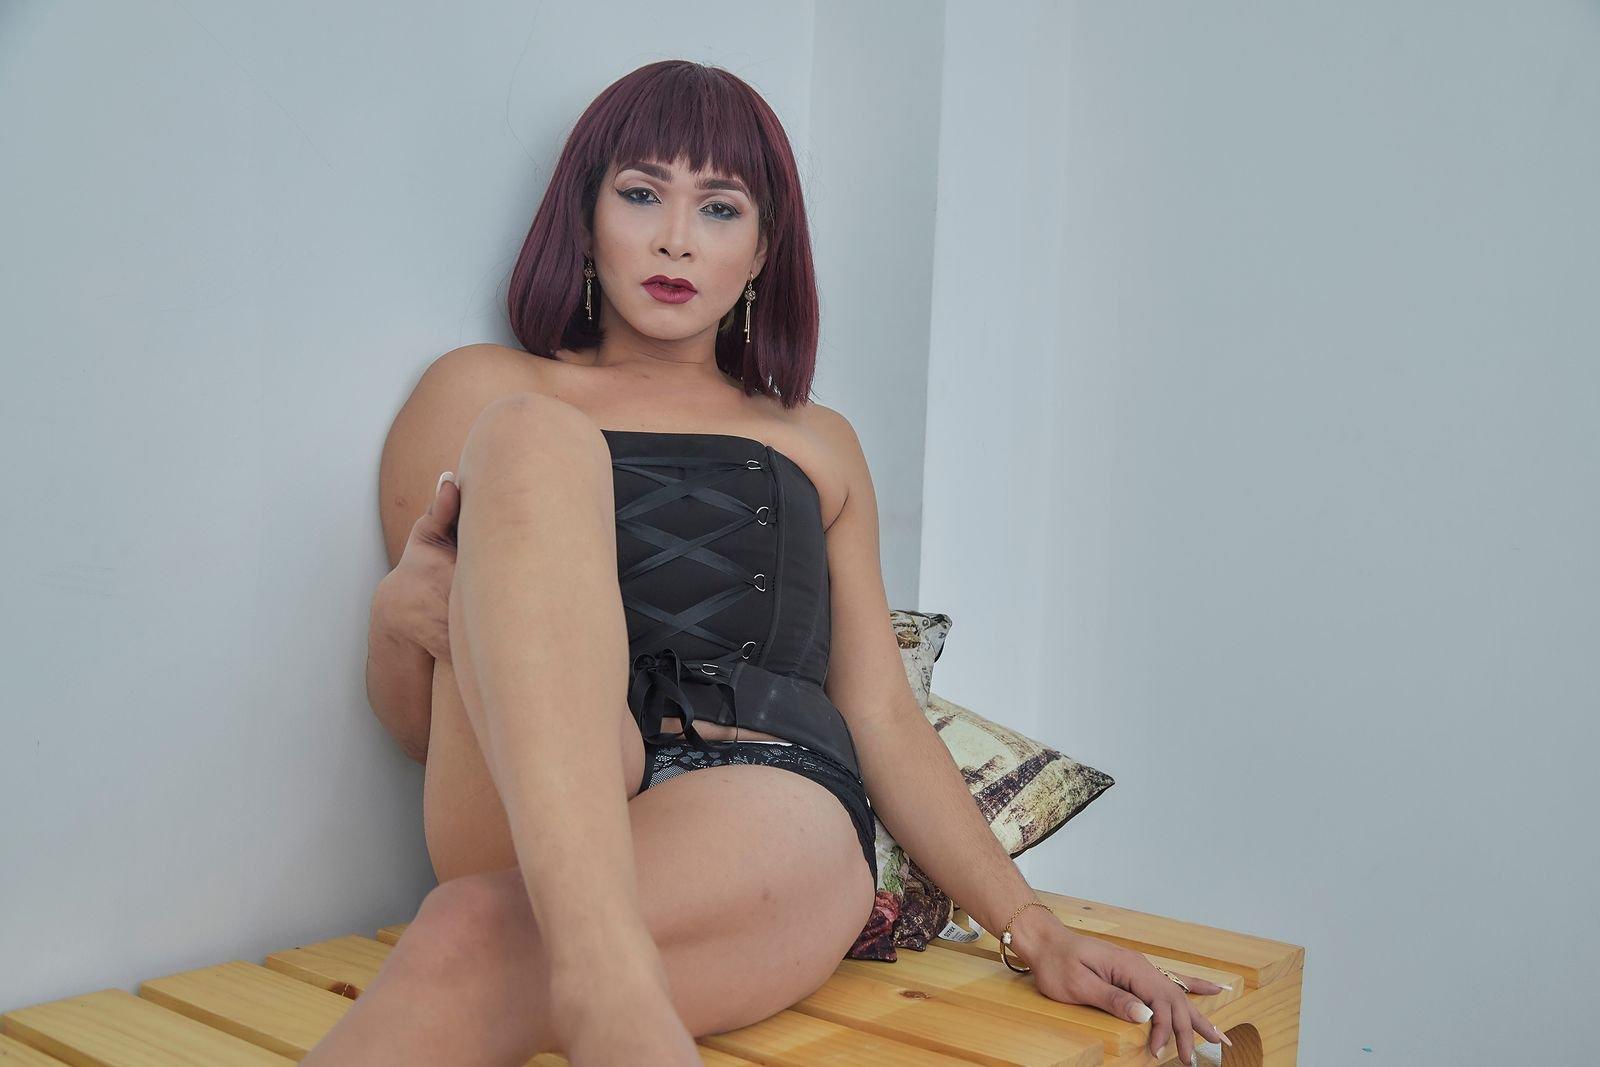 Alondra Porno alondra jones skype - live web cam show